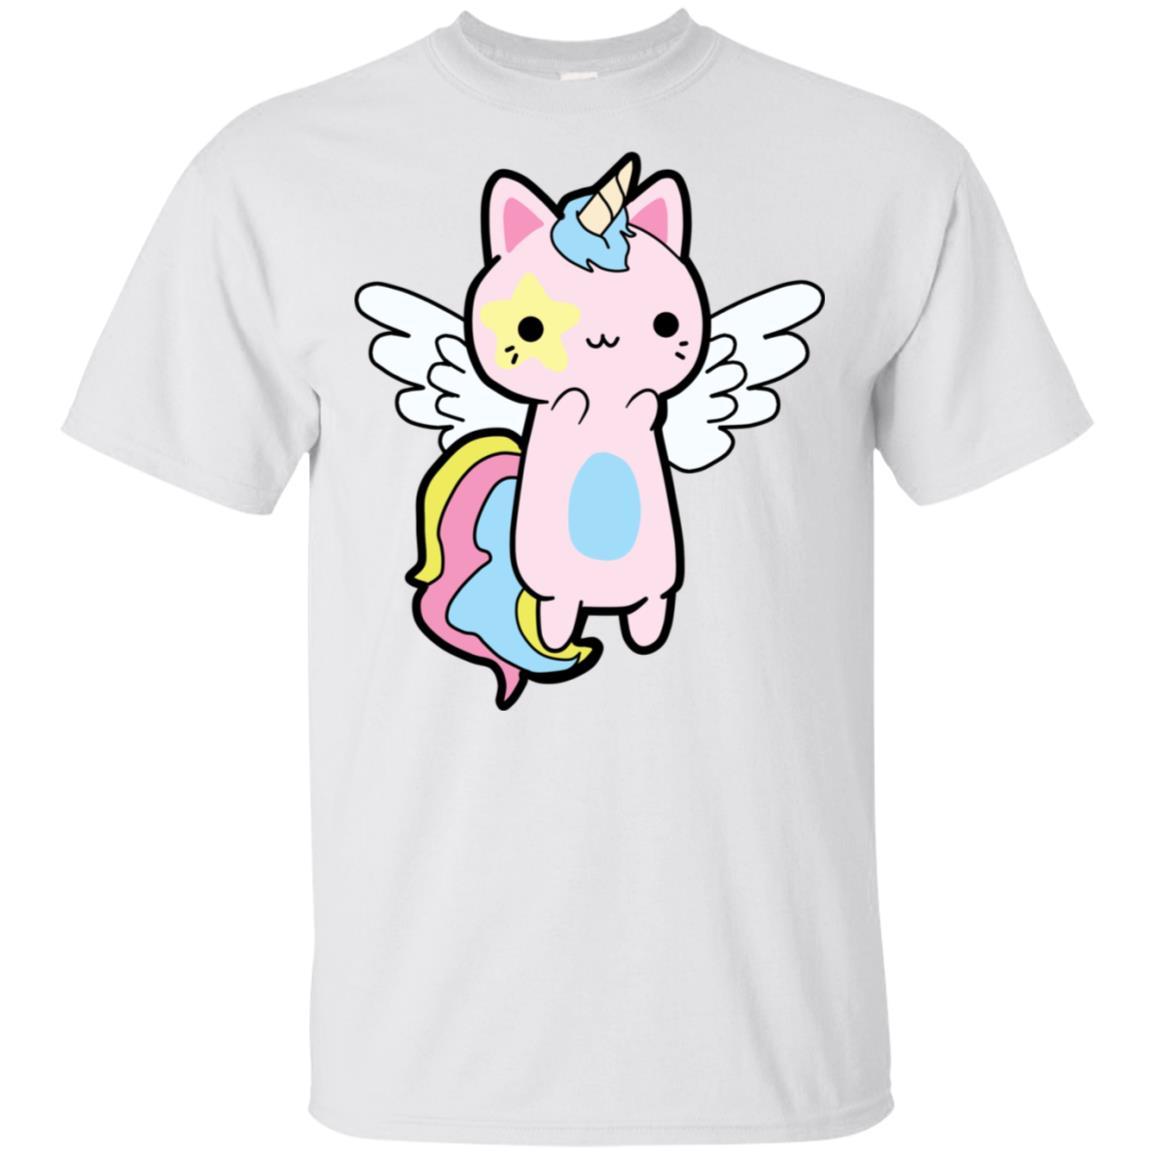 Kawaii Cat Unicorn Unisex Short Sleeve